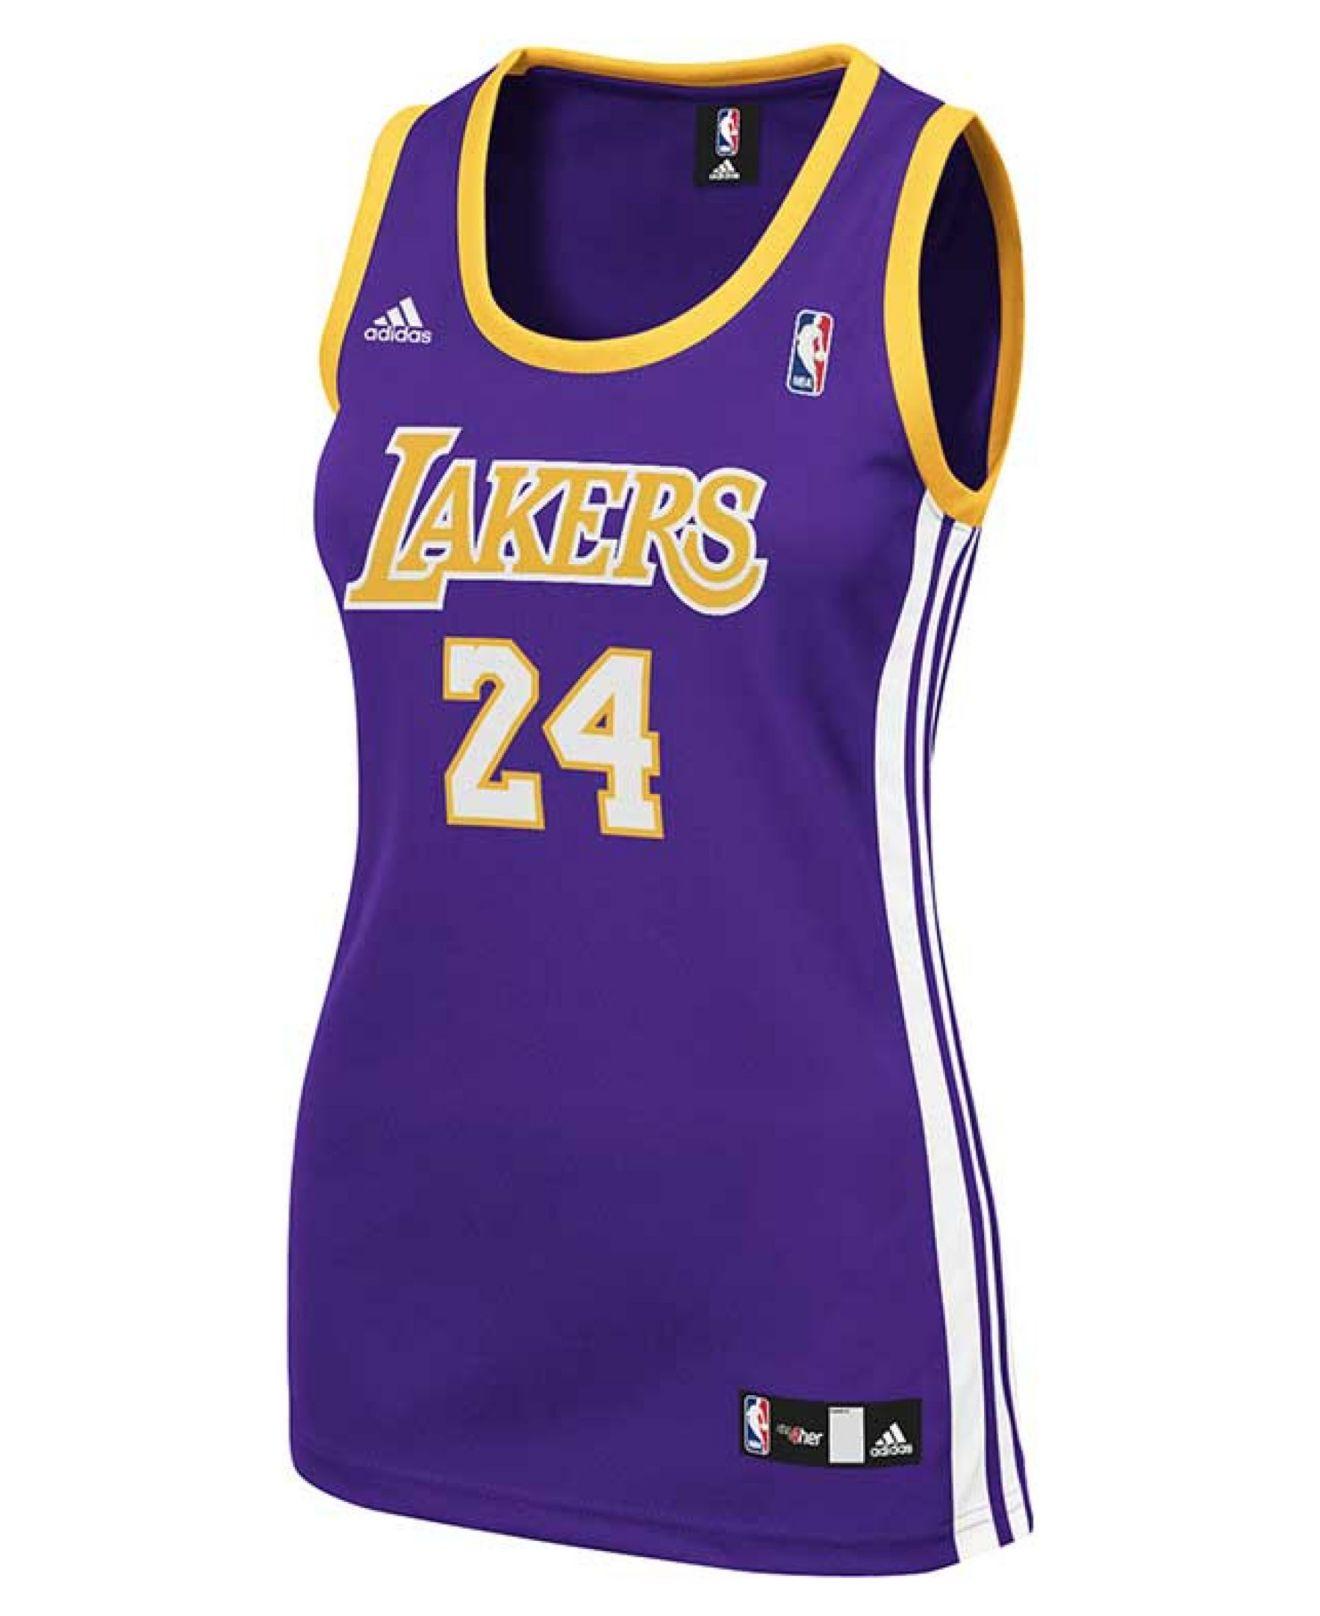 rxauda Adidas Women\'s Los Angeles Lakers Kobe Bryant Jersey in Purple | Lyst